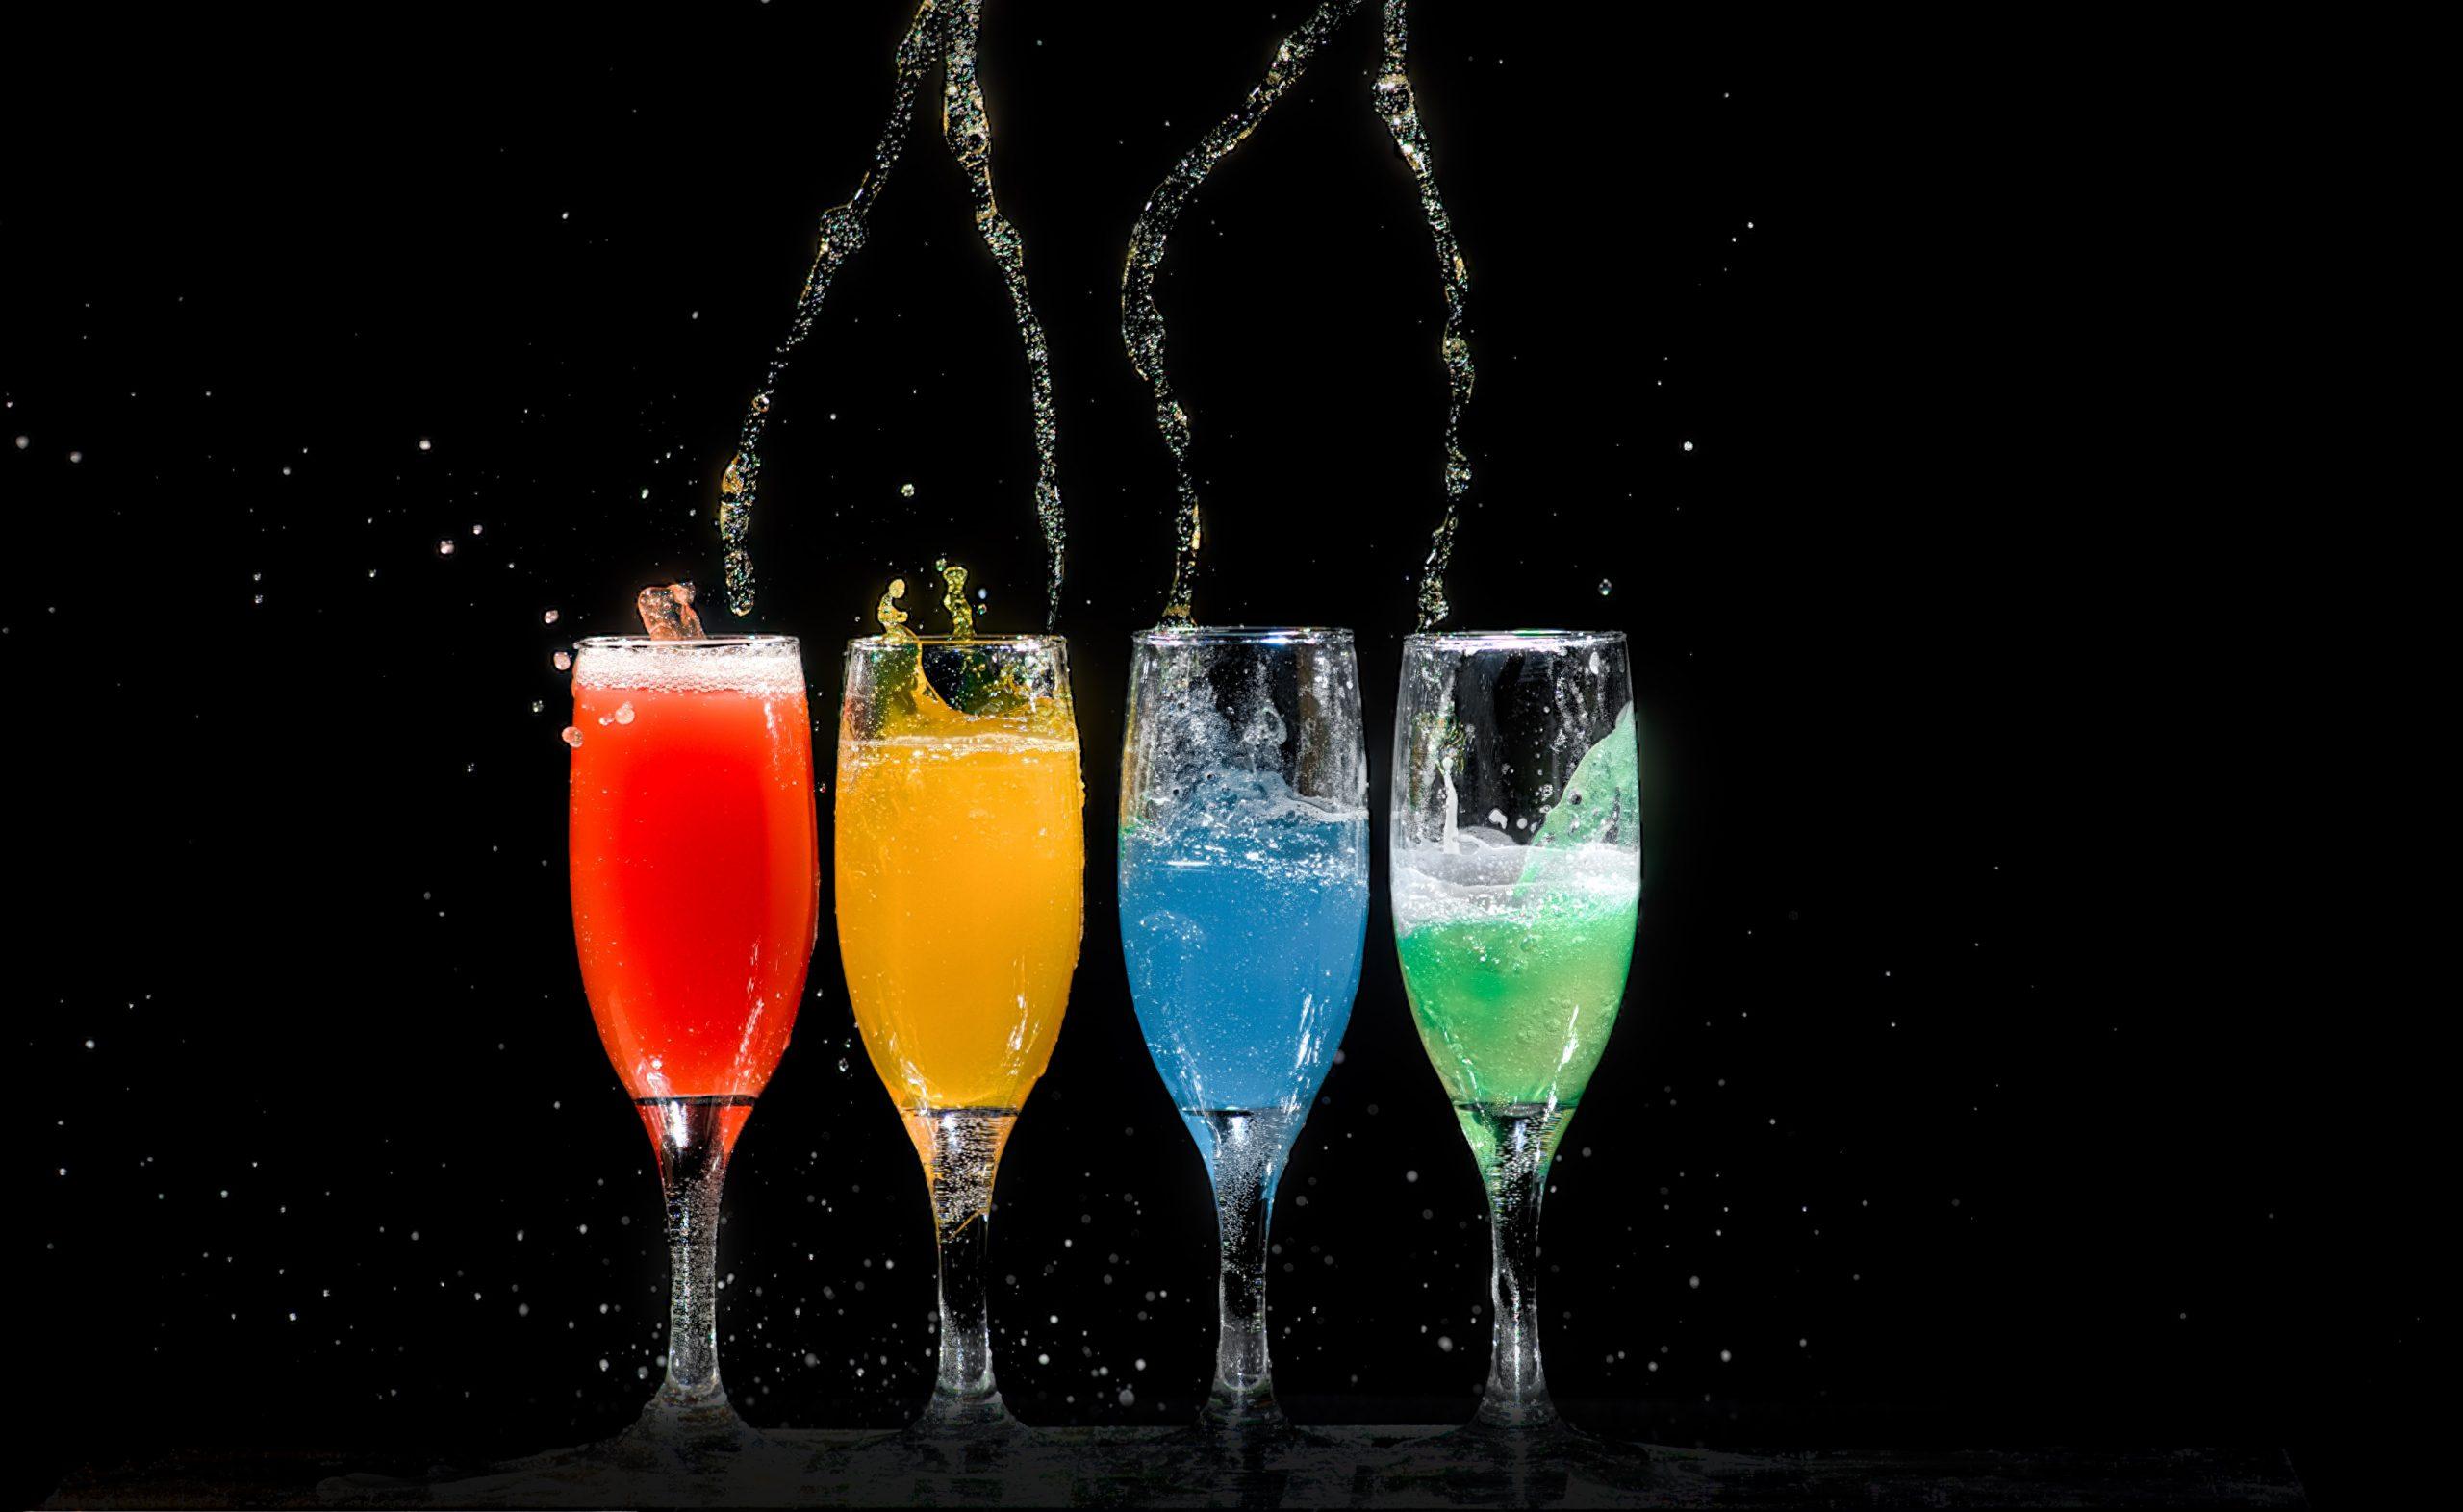 transferring your California liquor license in a business sale